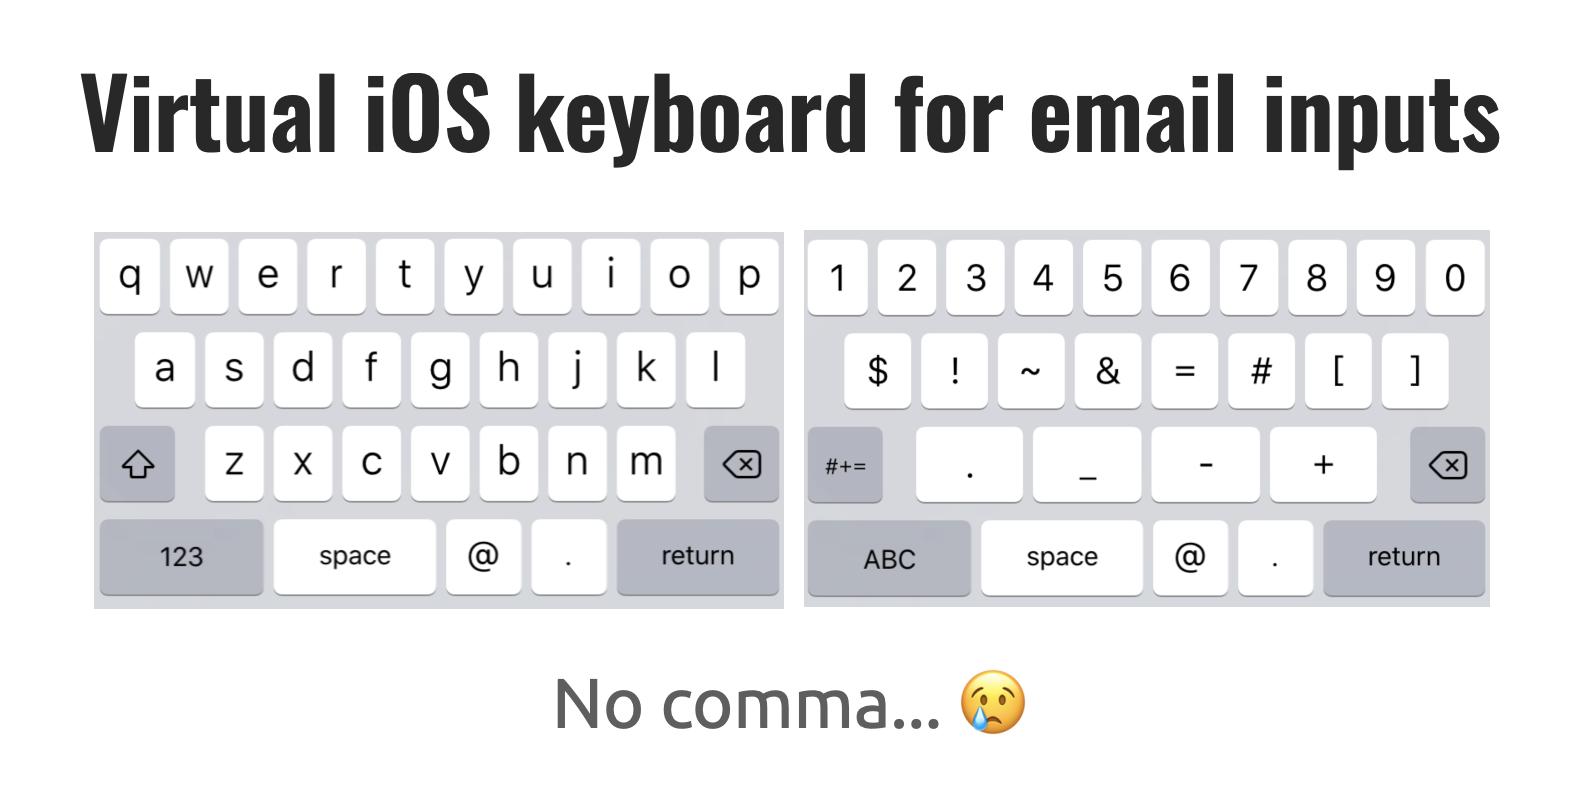 Virtual iOS keyboard not including a comma key